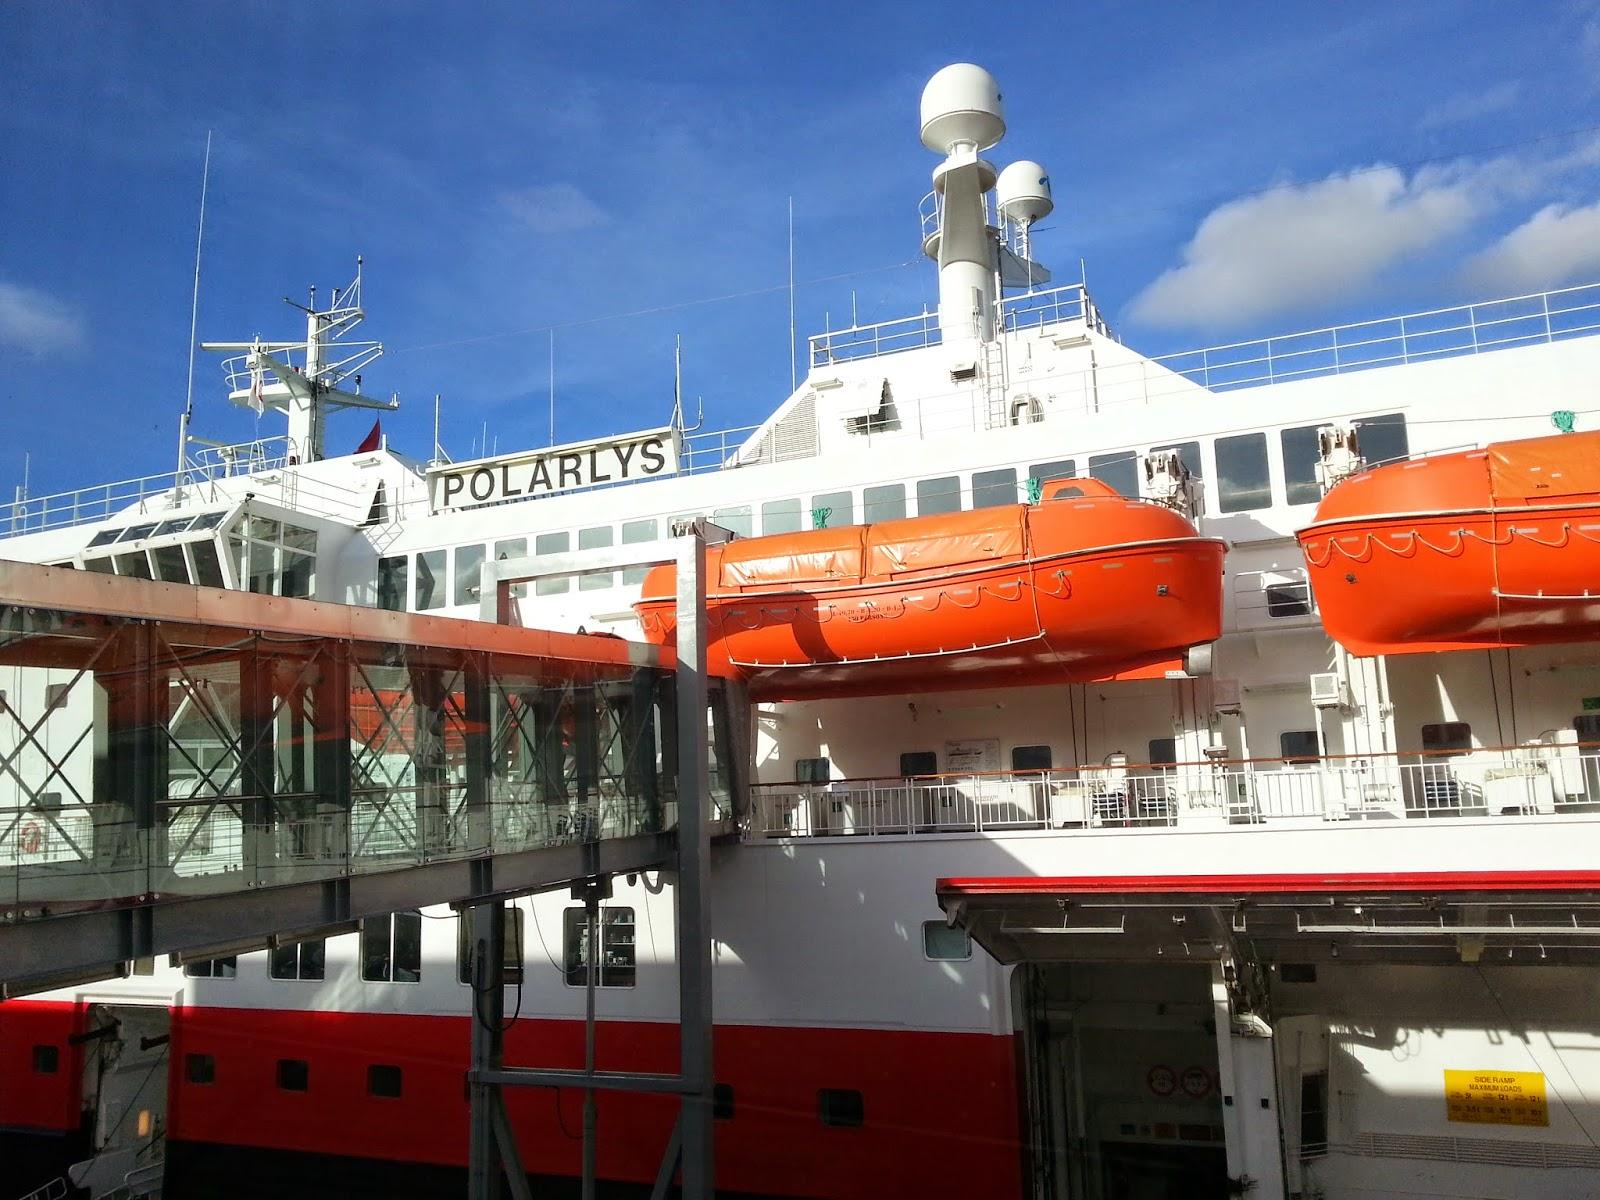 Hurtigruten MS Polarlys in Bergen, Norway